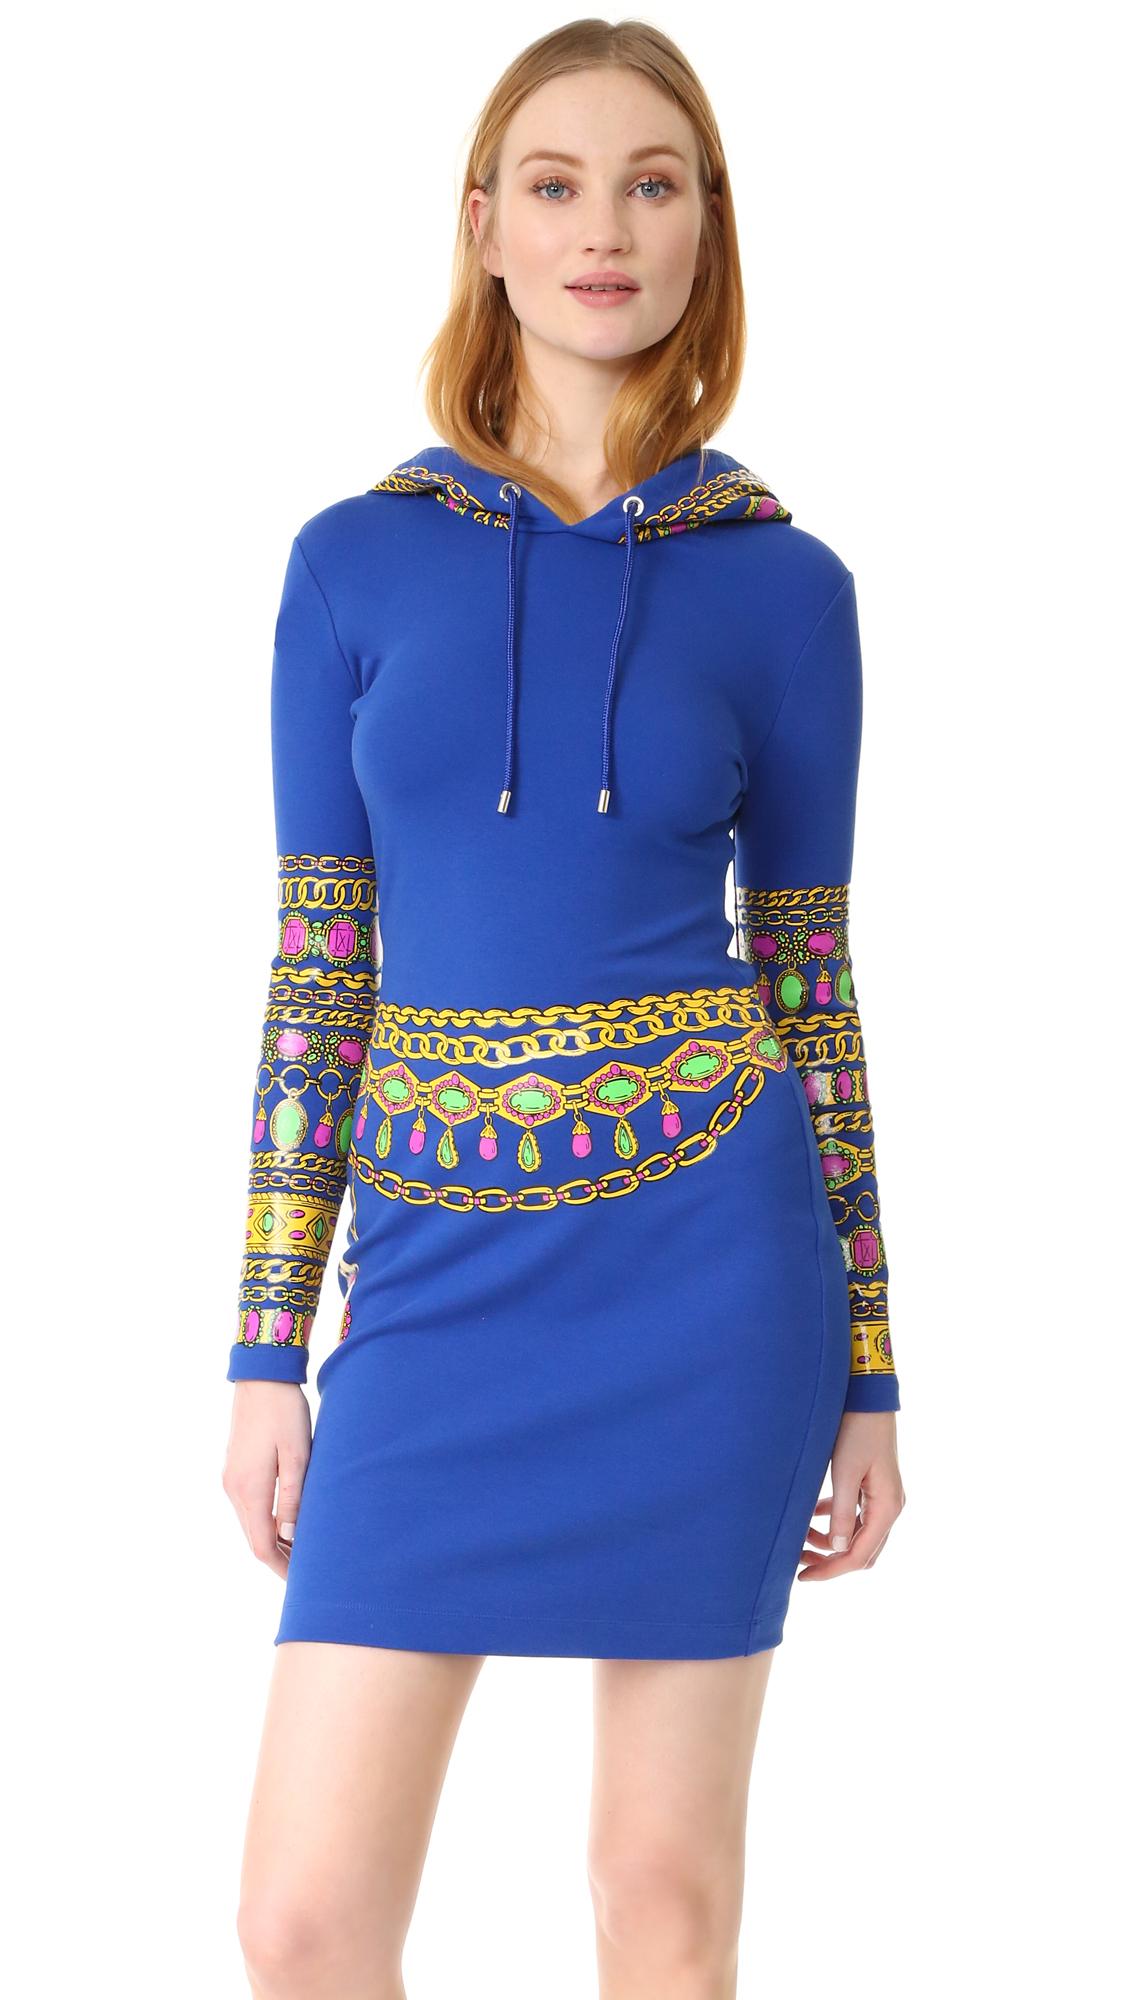 Moschino Hooded Dress - Fantasy Print Blue at Shopbop